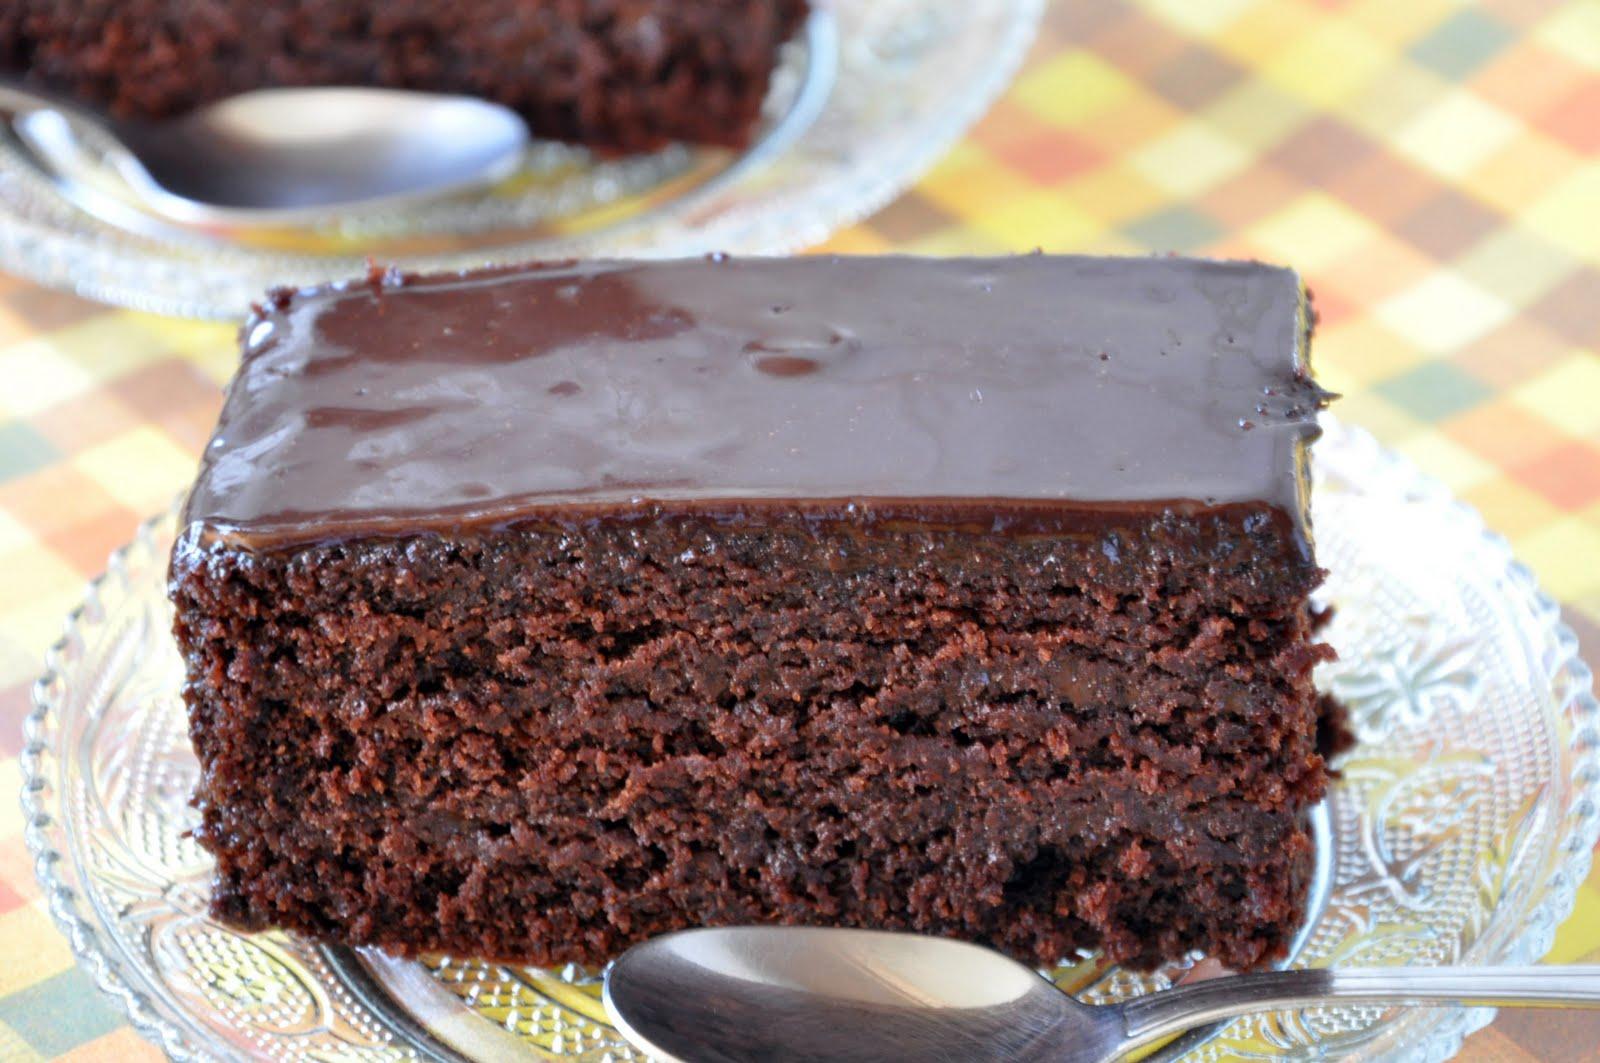 Chocolate Truffle Cake Description